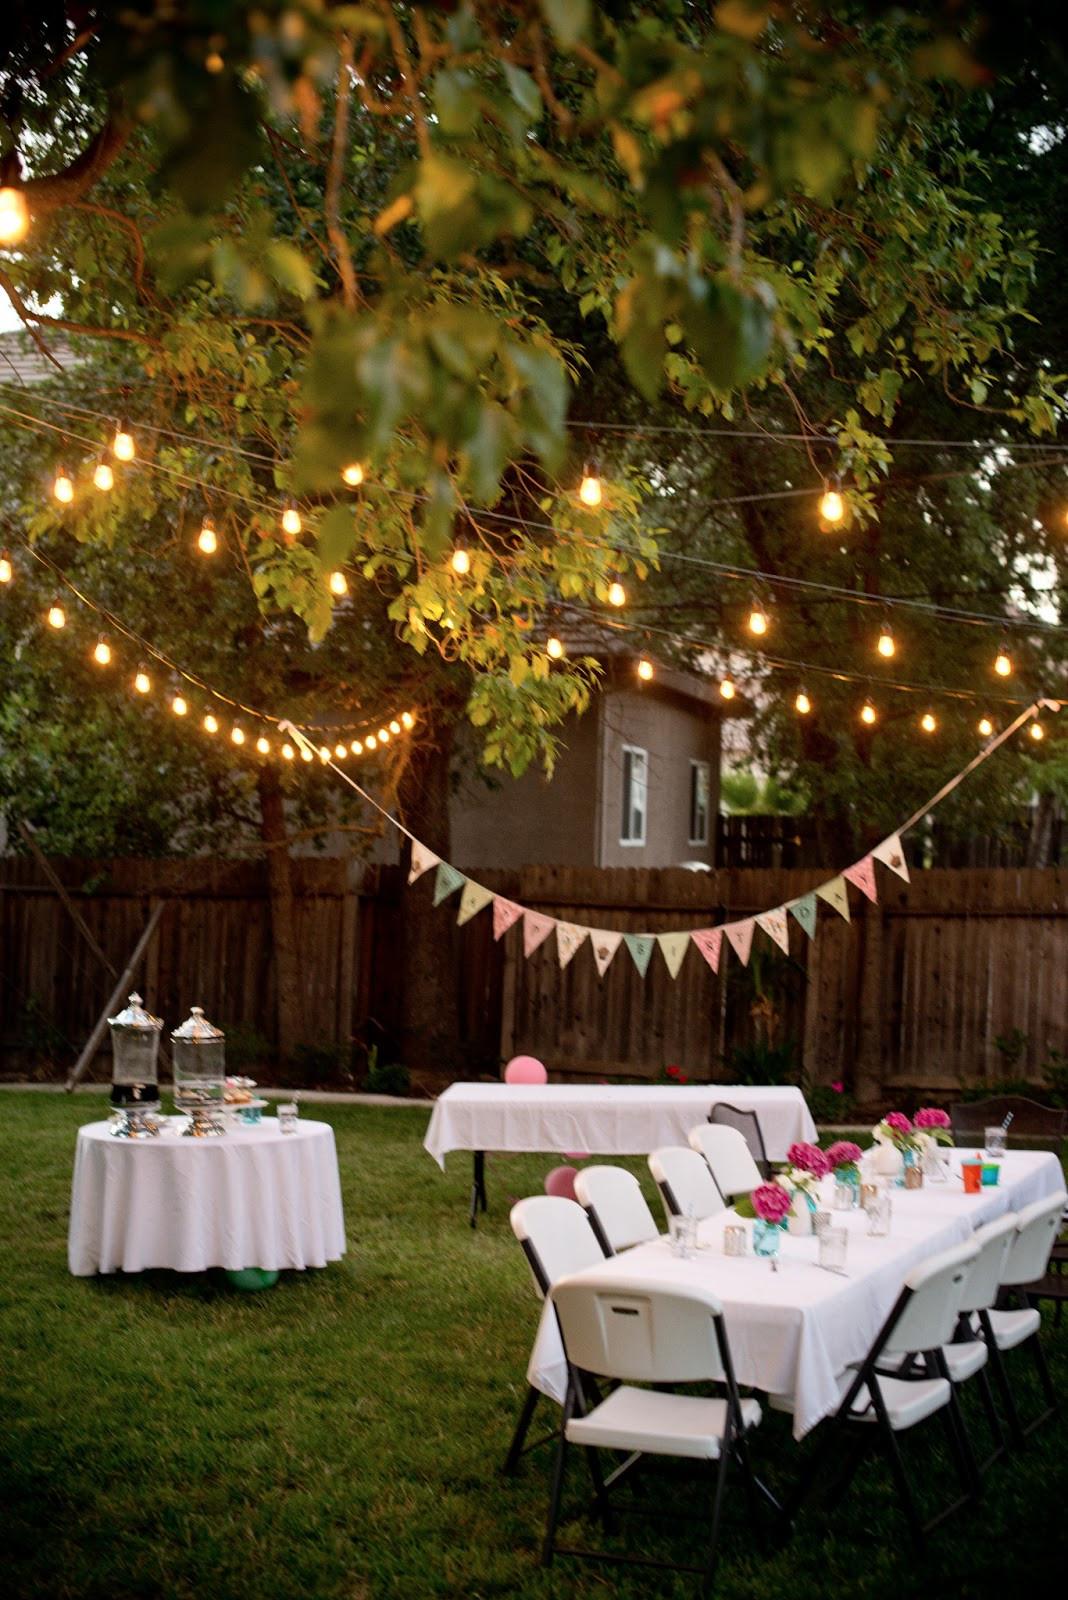 Backyard 21St Birthday Party Ideas  Domestic Fashionista Backyard Birthday Fun Pink